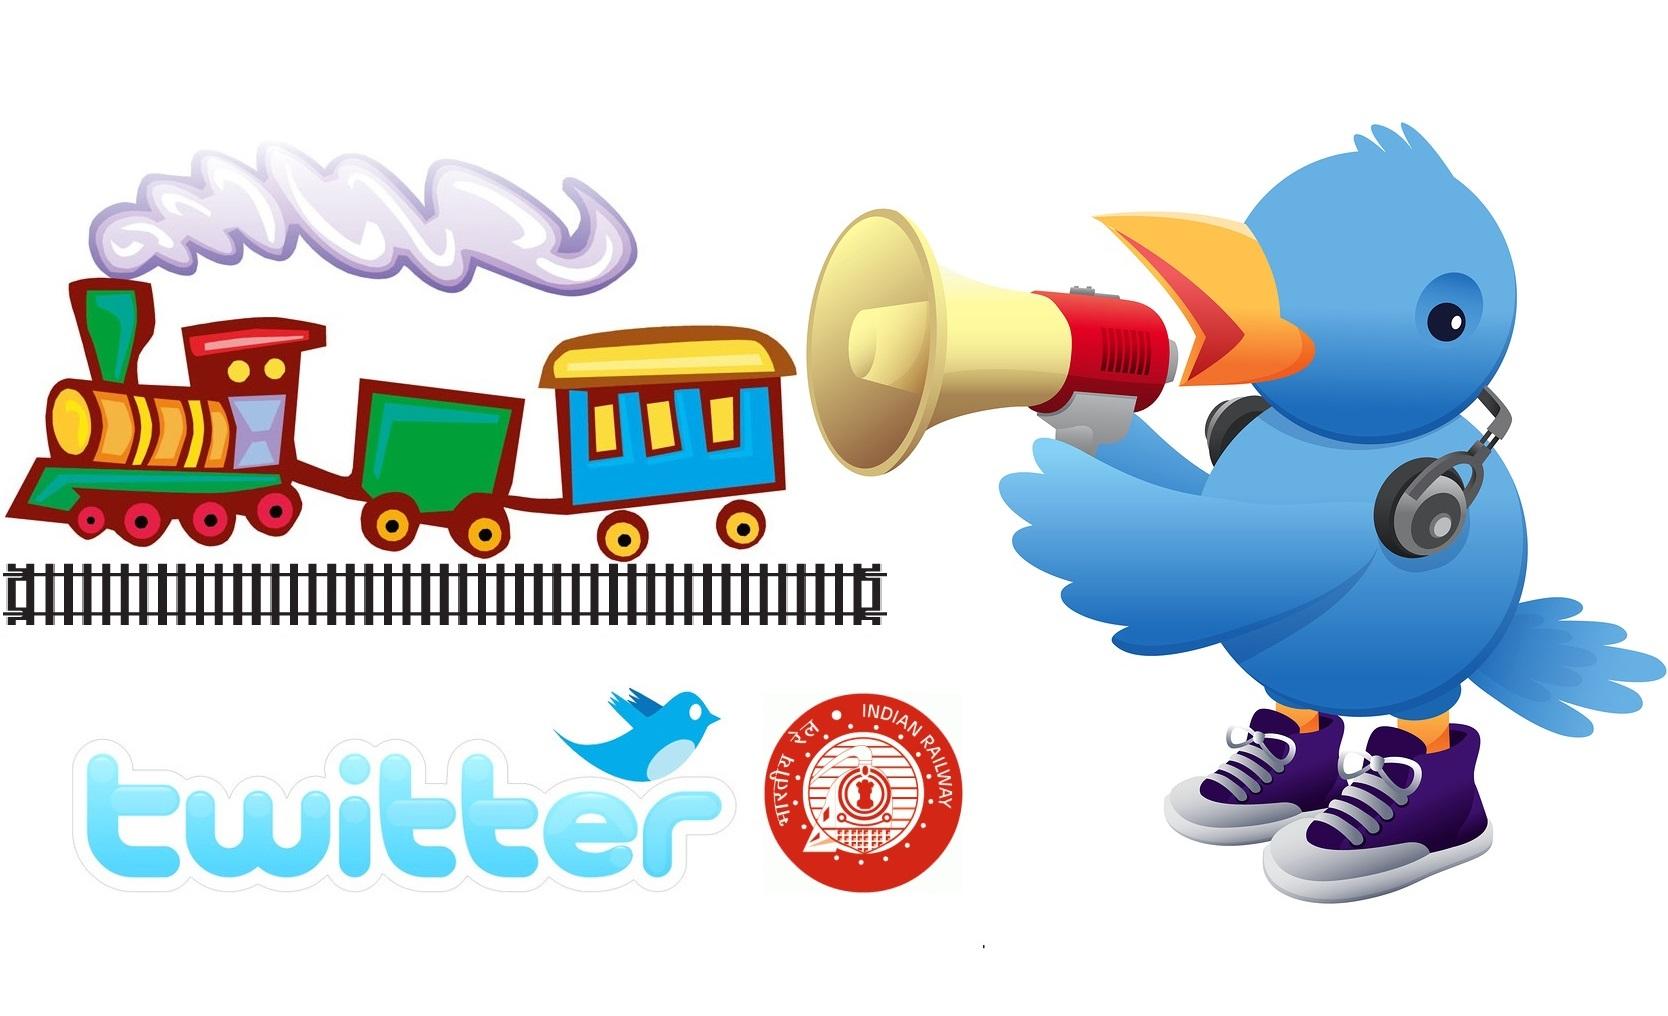 Railway and social media